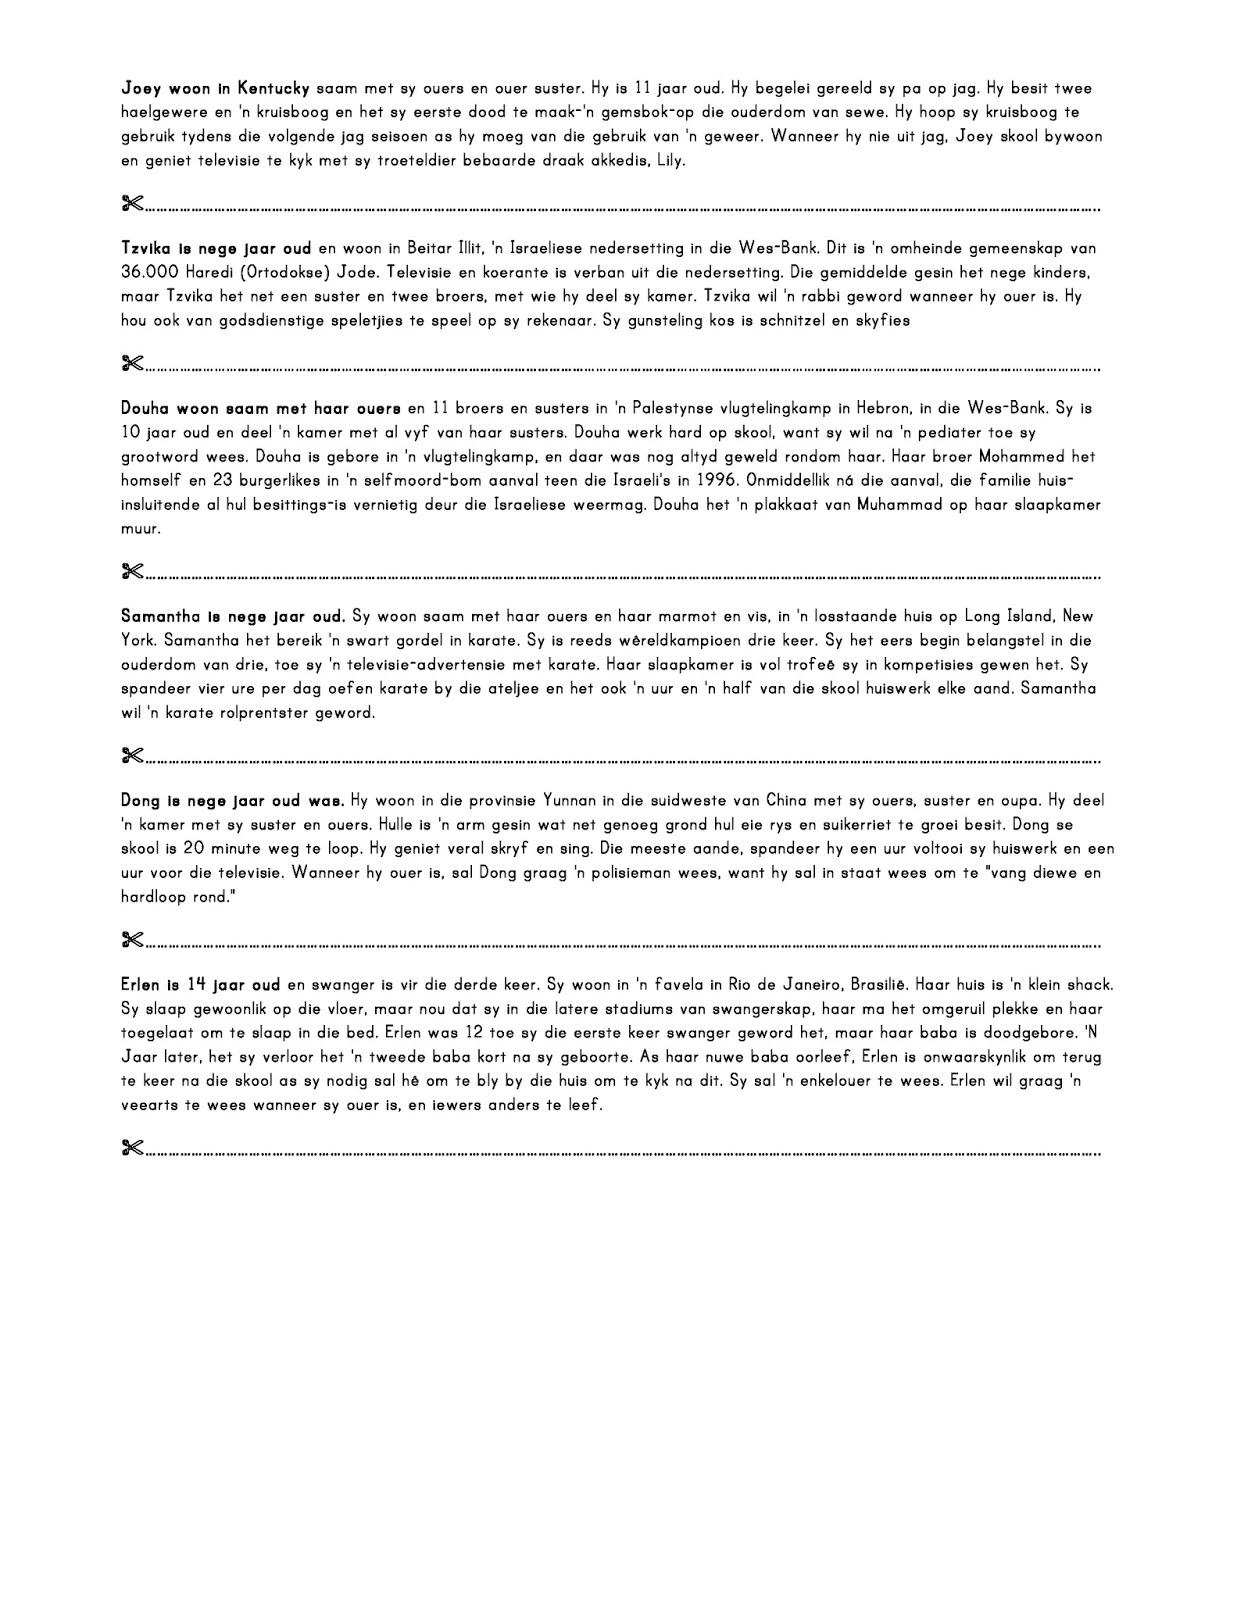 018 My School Essay Example Foto2btext Page Amazing Dream For Class 10 In Urdu 1 3 Marathi Full